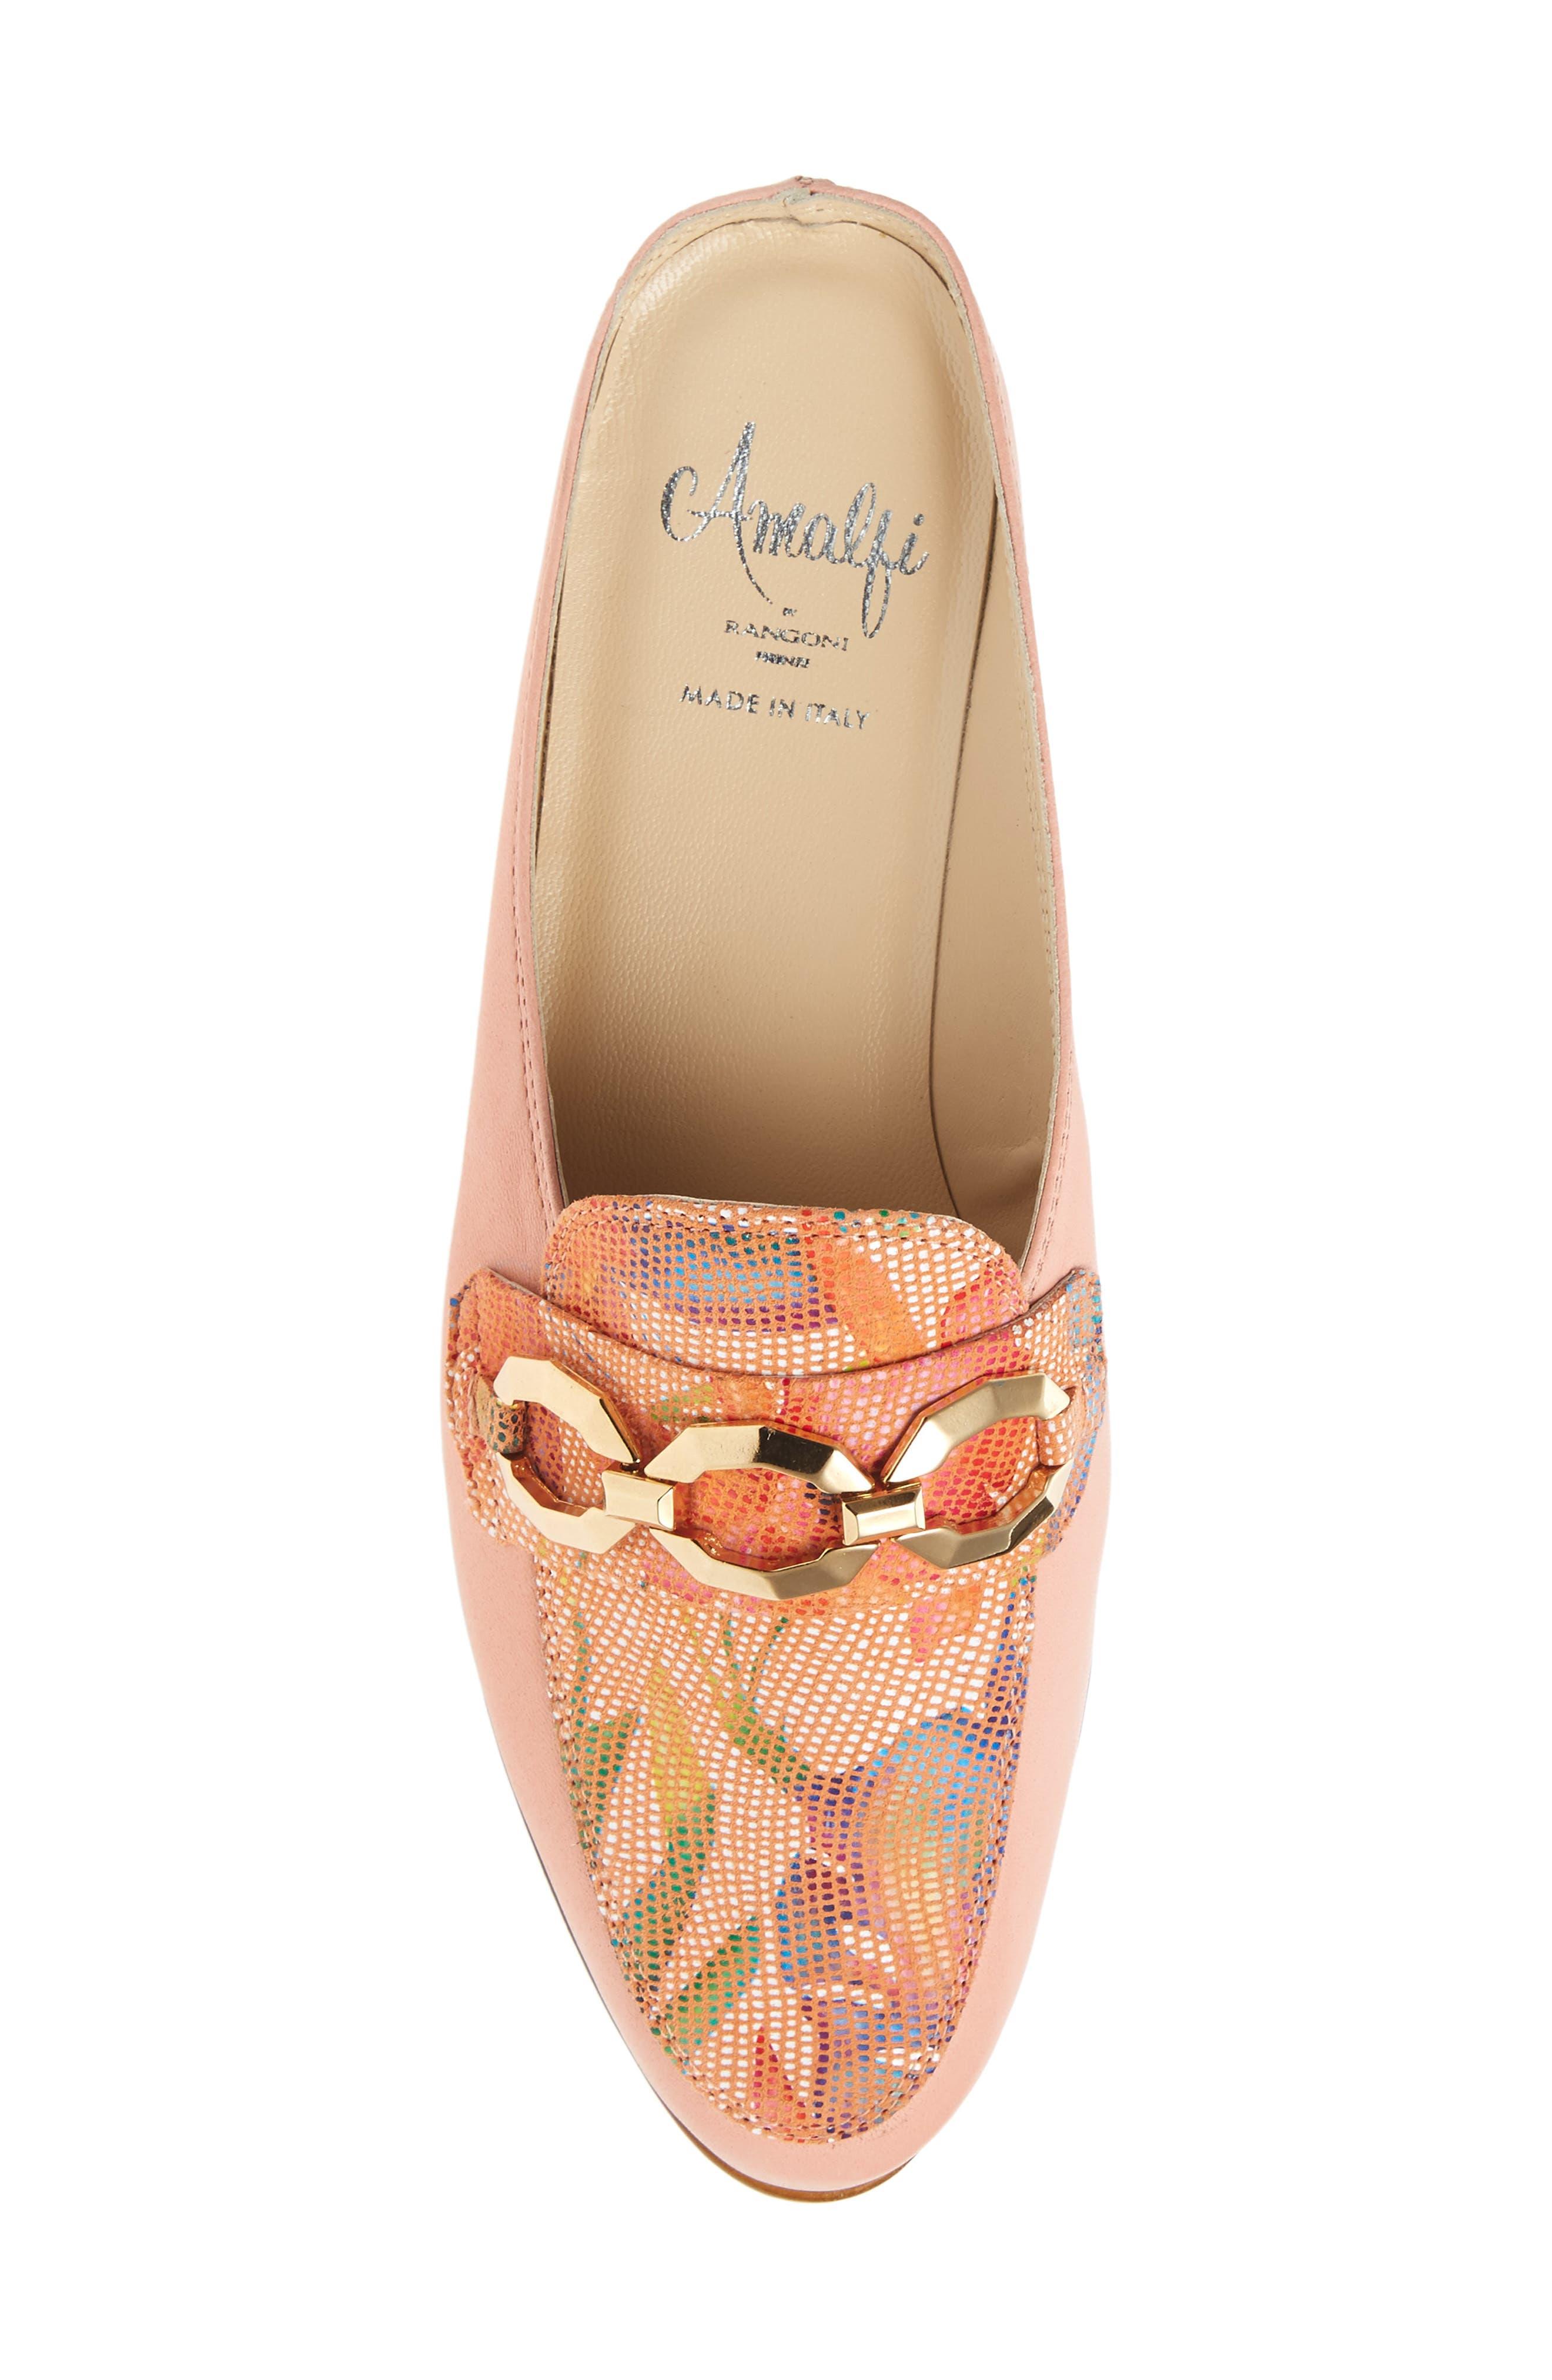 Almafi by Rangoni Otranto Loafer Slide,                             Alternate thumbnail 5, color,                             Rose Leather